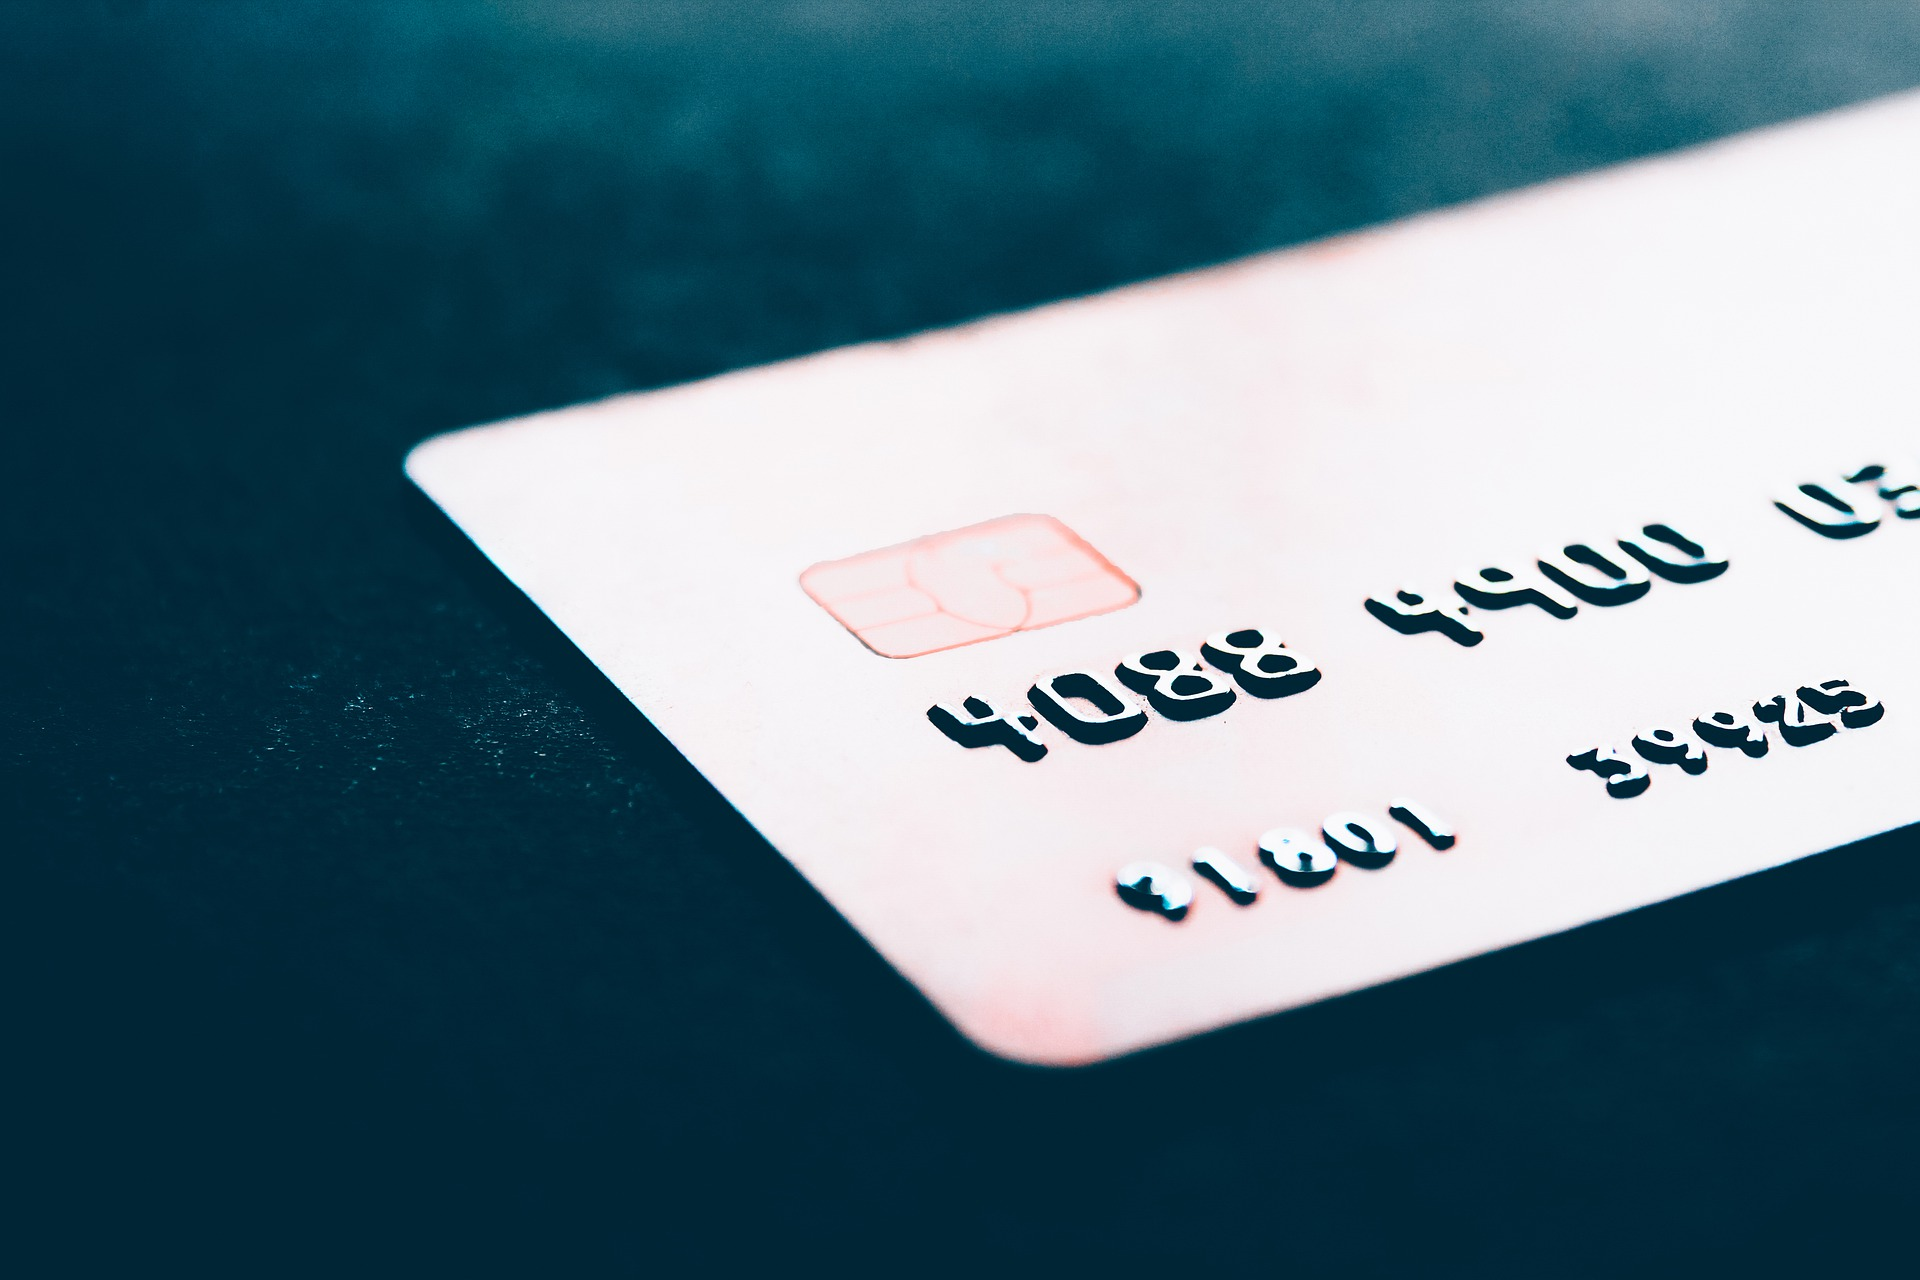 Swipe lanza LendFi, una plataforma con tarjetas Visa para préstamos DeFi